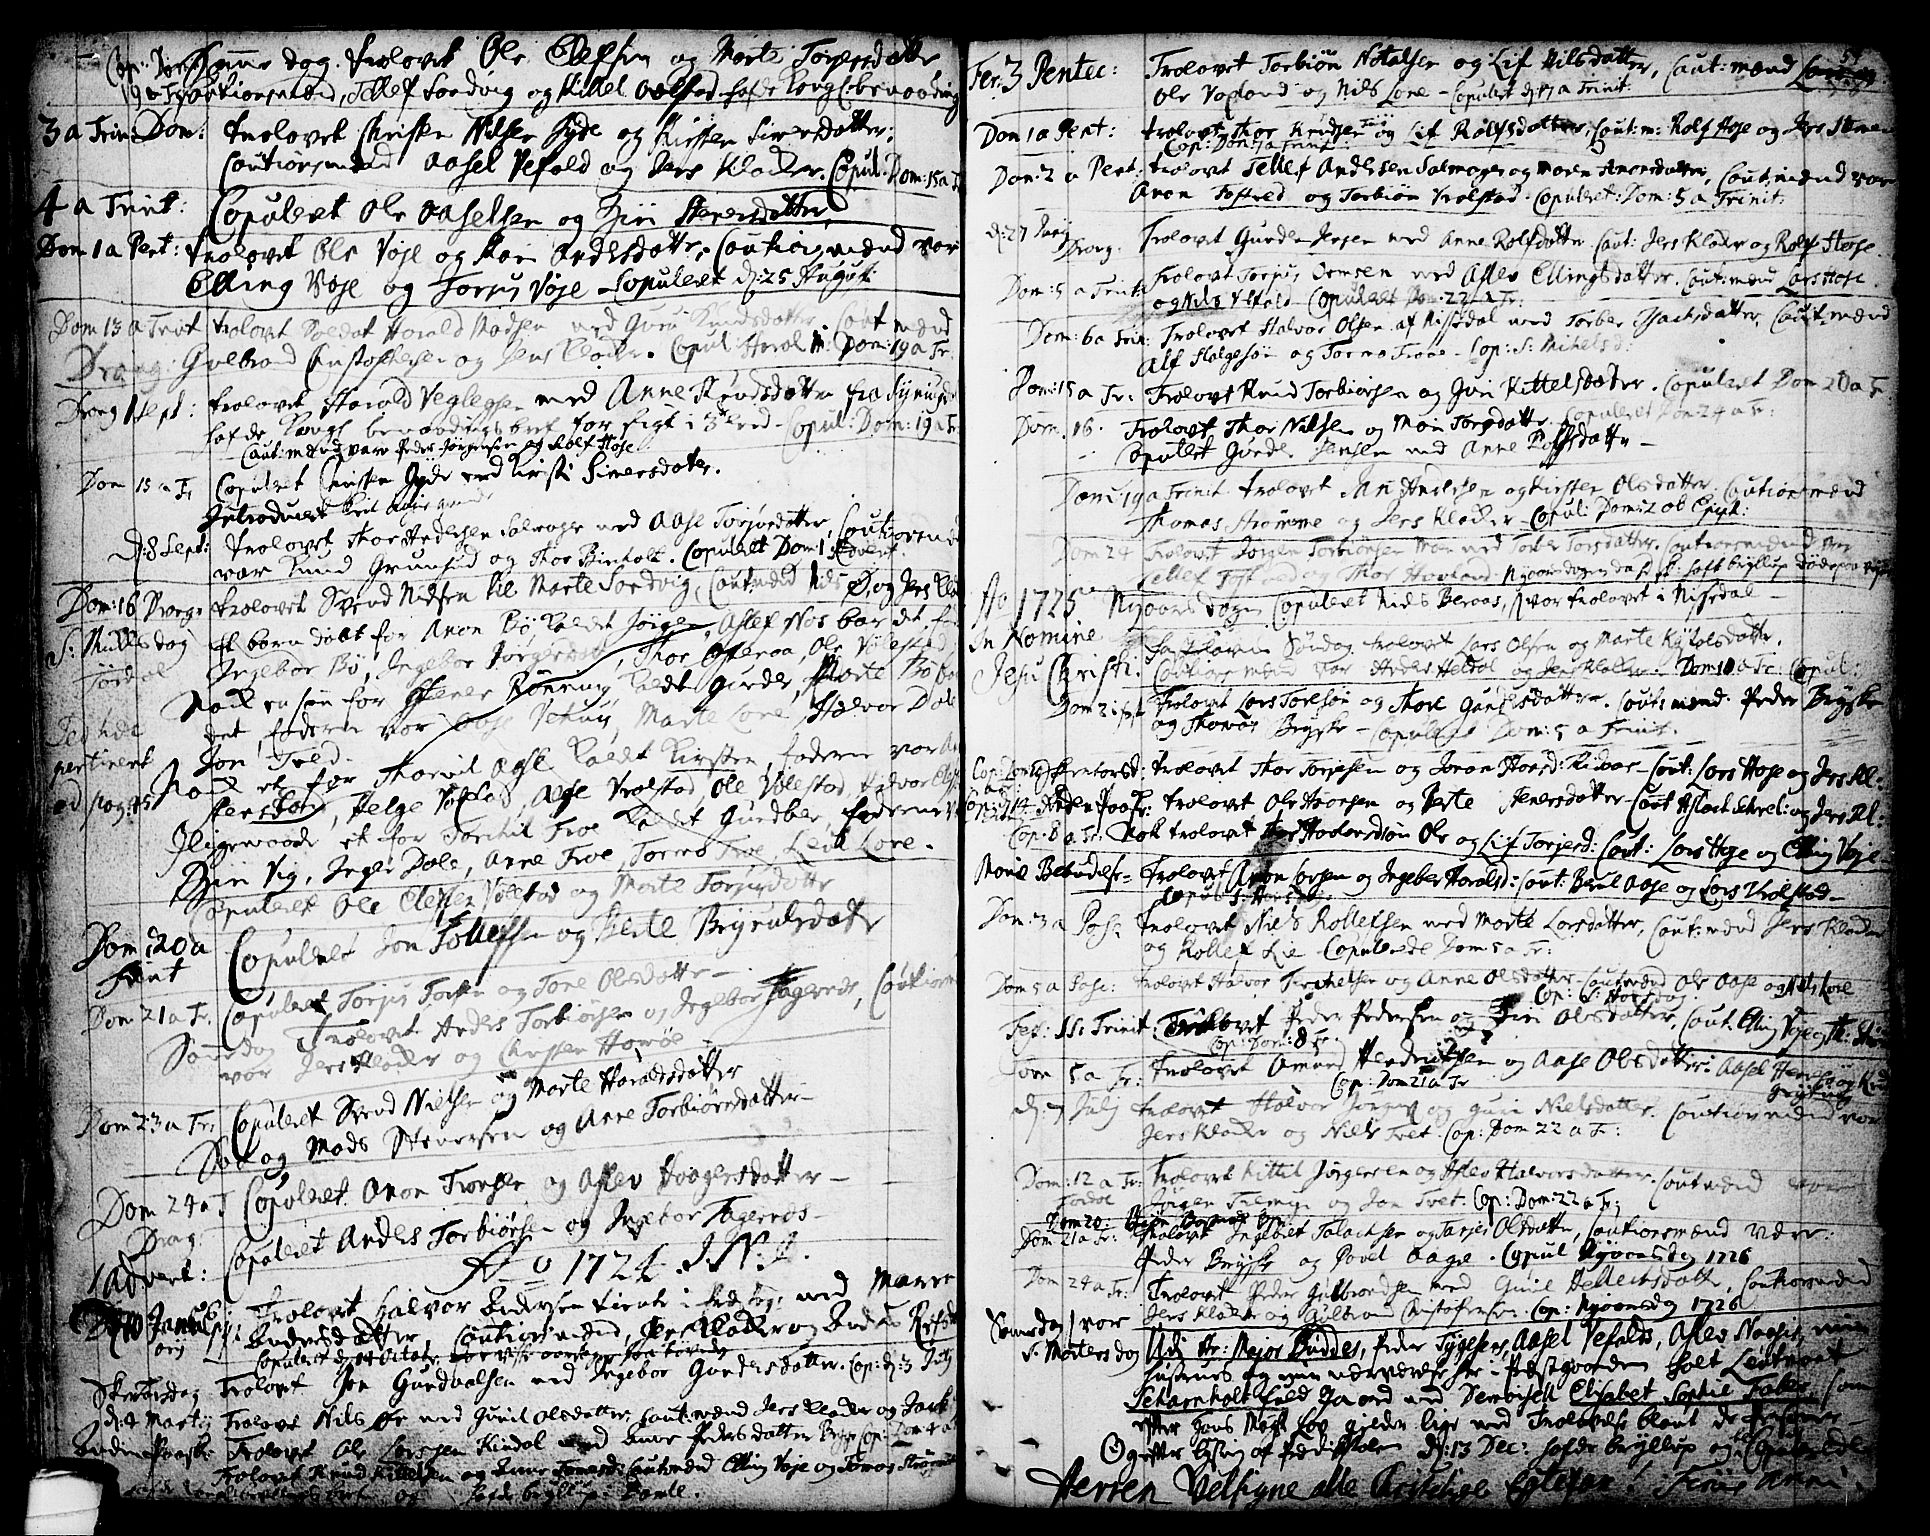 SAKO, Drangedal kirkebøker, F/Fa/L0001: Ministerialbok nr. 1, 1697-1767, s. 54